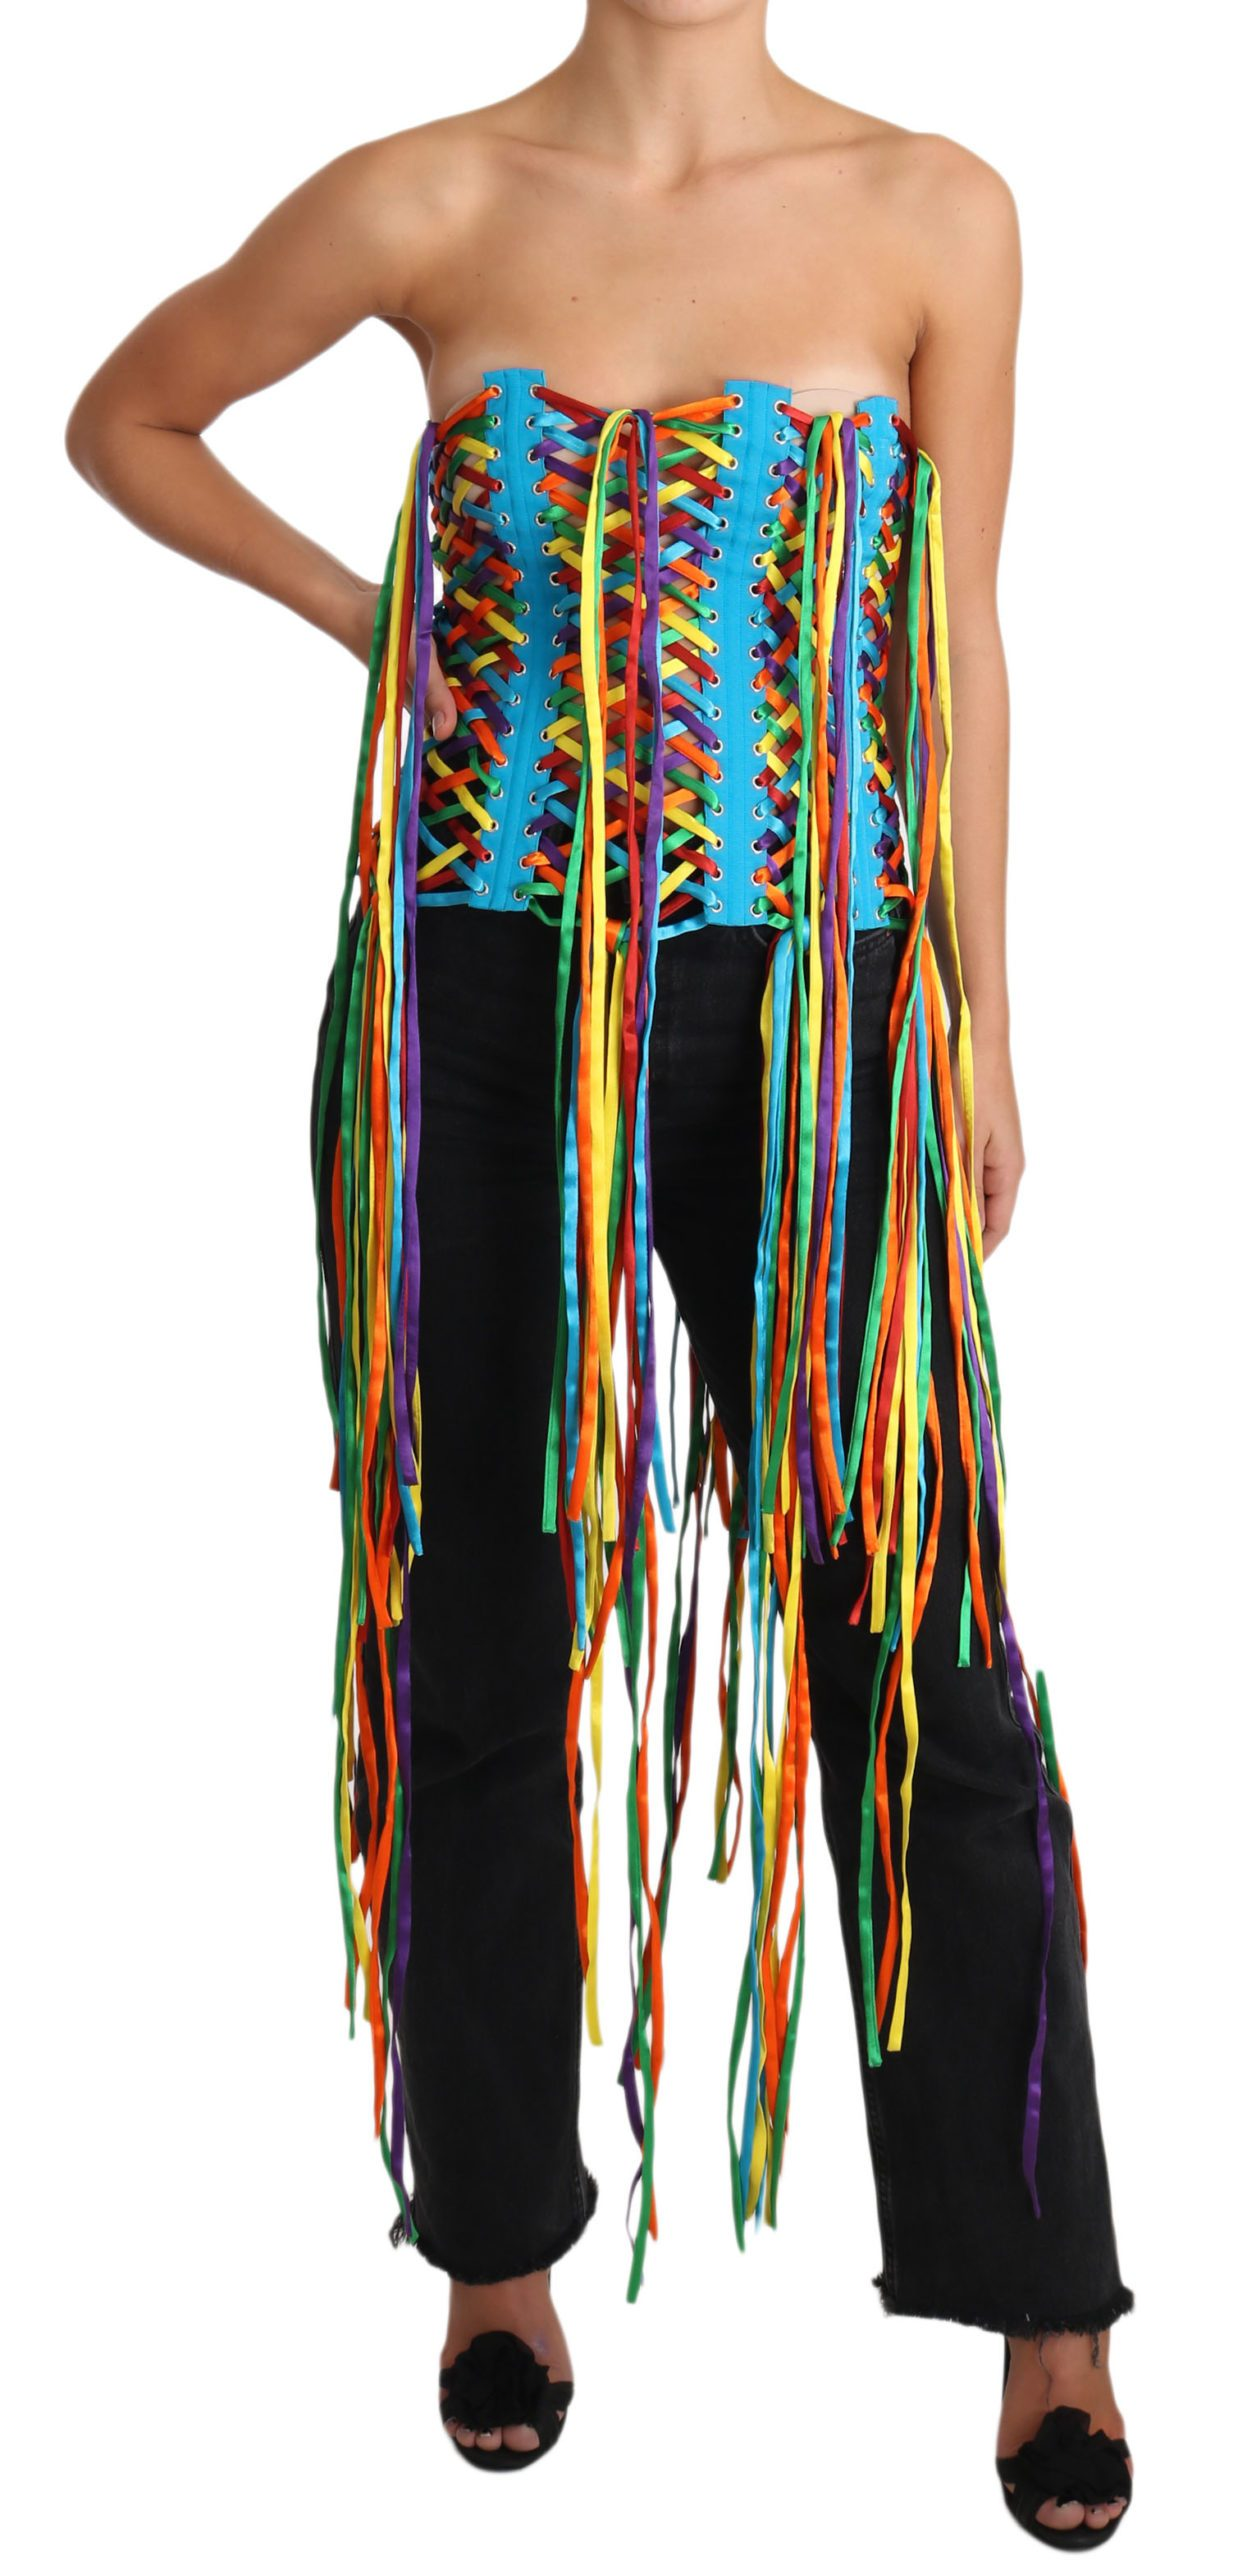 Dolce & Gabbana Women's Polyester Corset Top Multicolor TSH3405 - IT38 XS